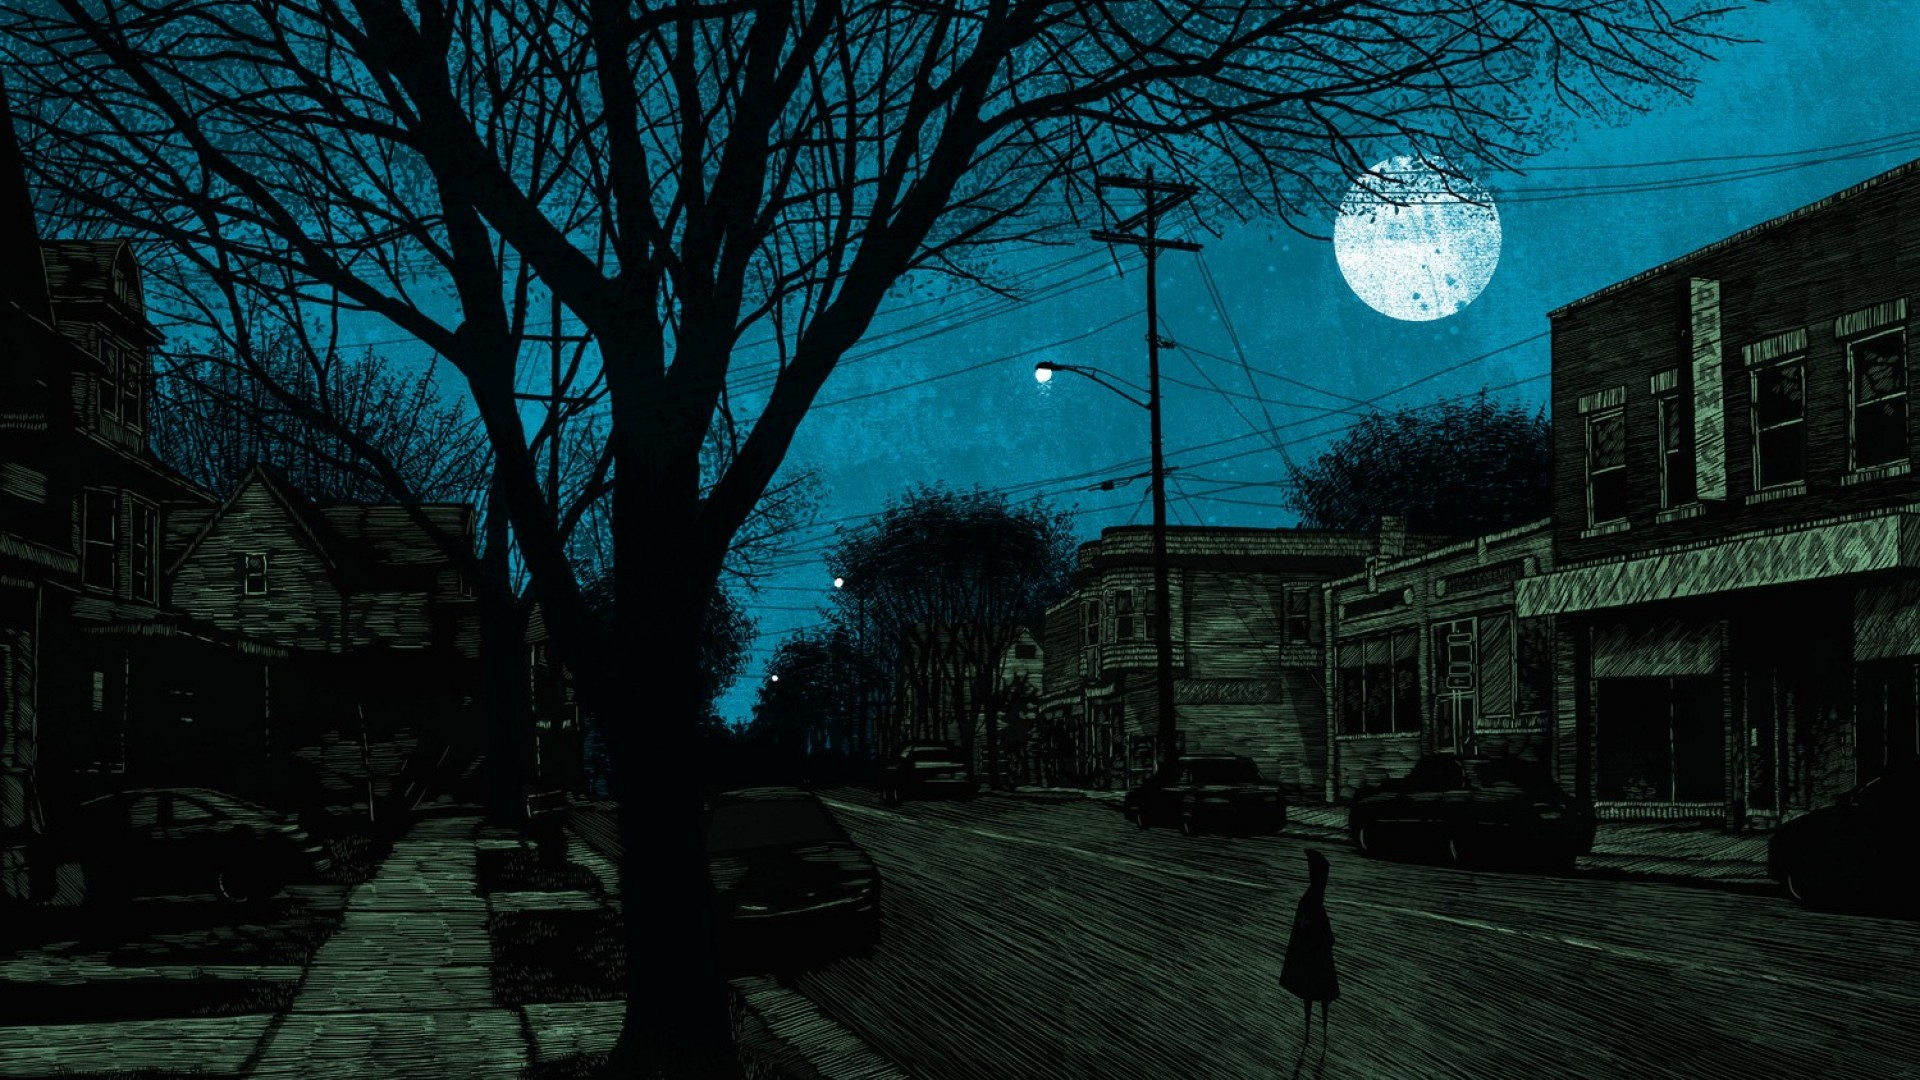 General 1920x1080 dark town creepy night artwork Moon